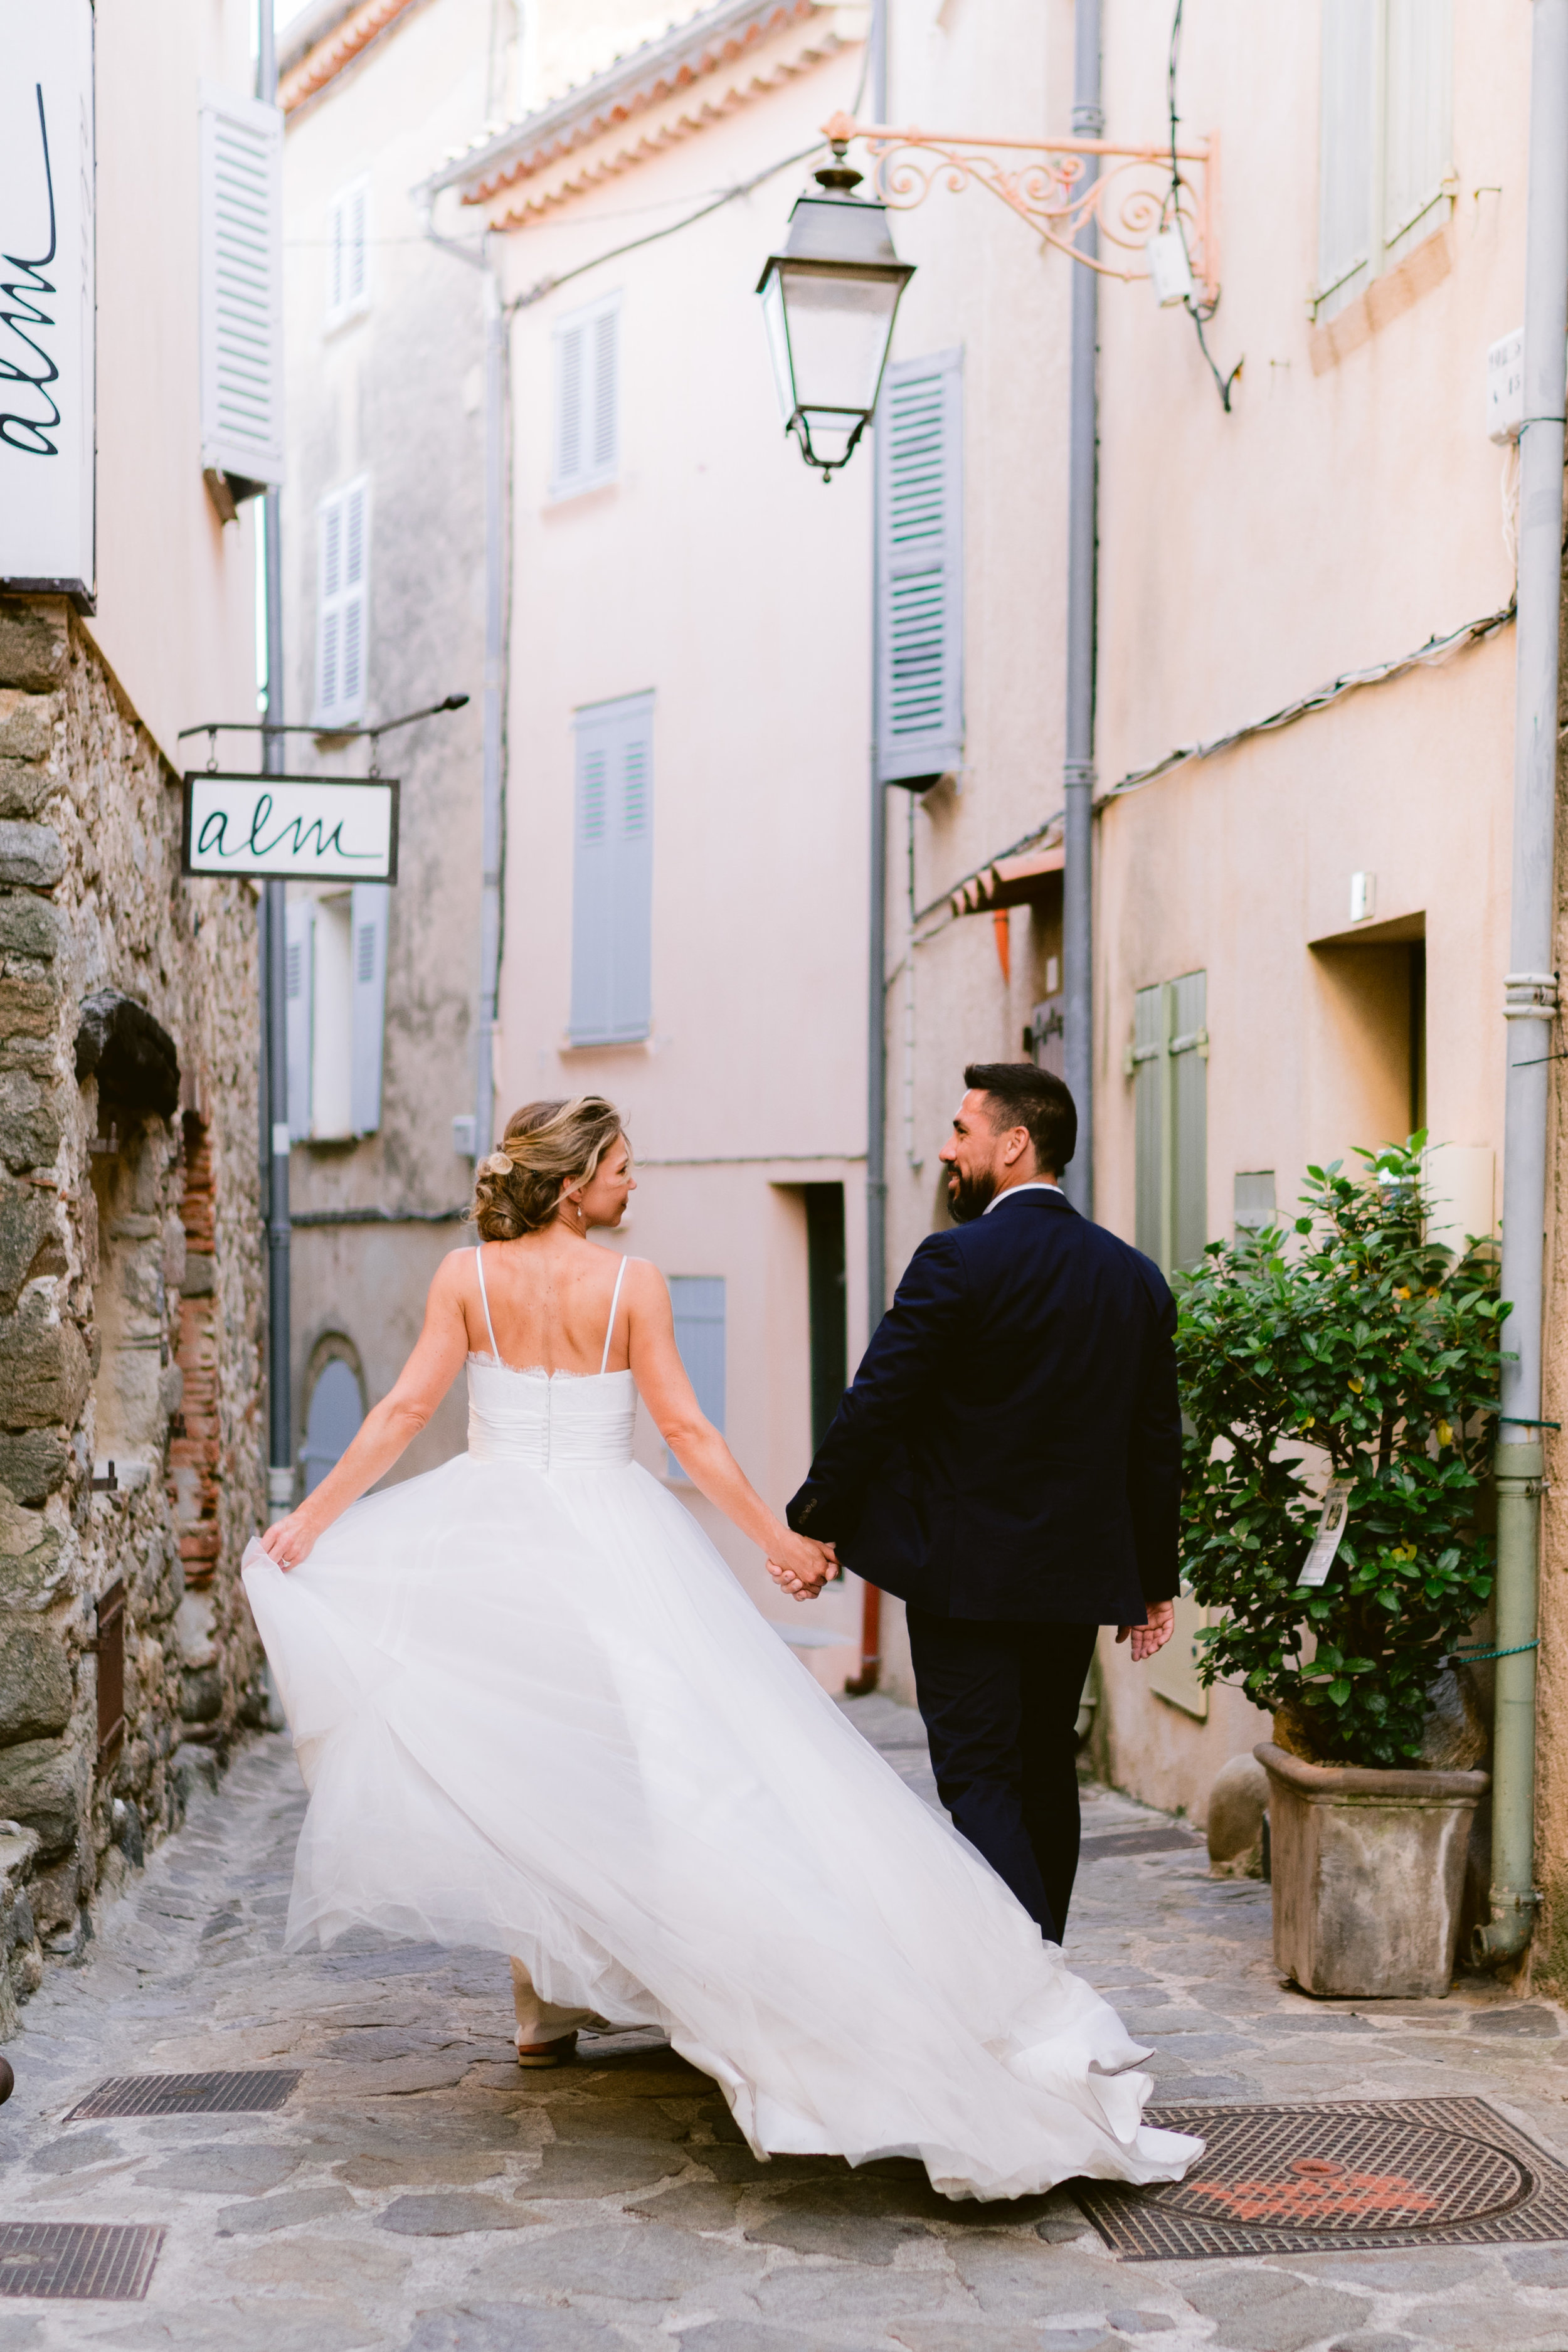 english photographer in france, wedding photographer saint tropez, romantic wedding photography france, chateau wedding france, cote d'azur wedding photographer, ramatuelle wedding (24).jpg